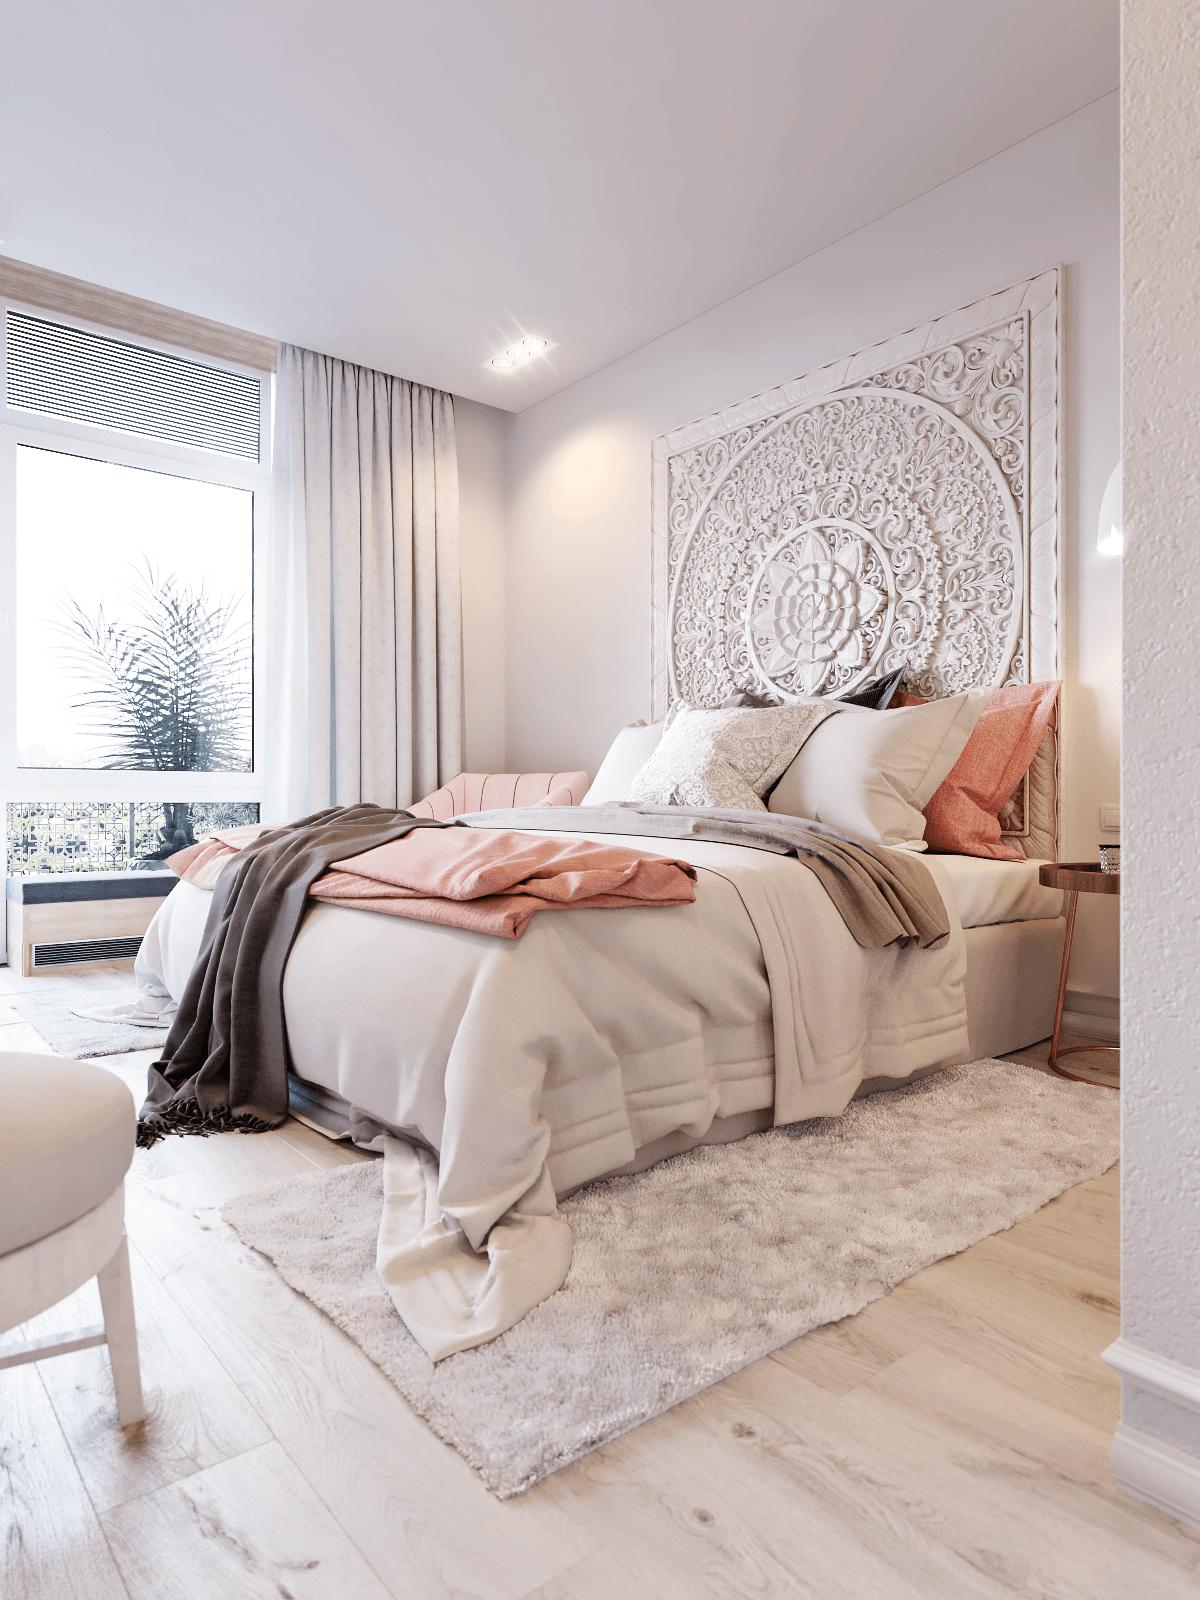 Room 30 Warm and Cozy Bedroom